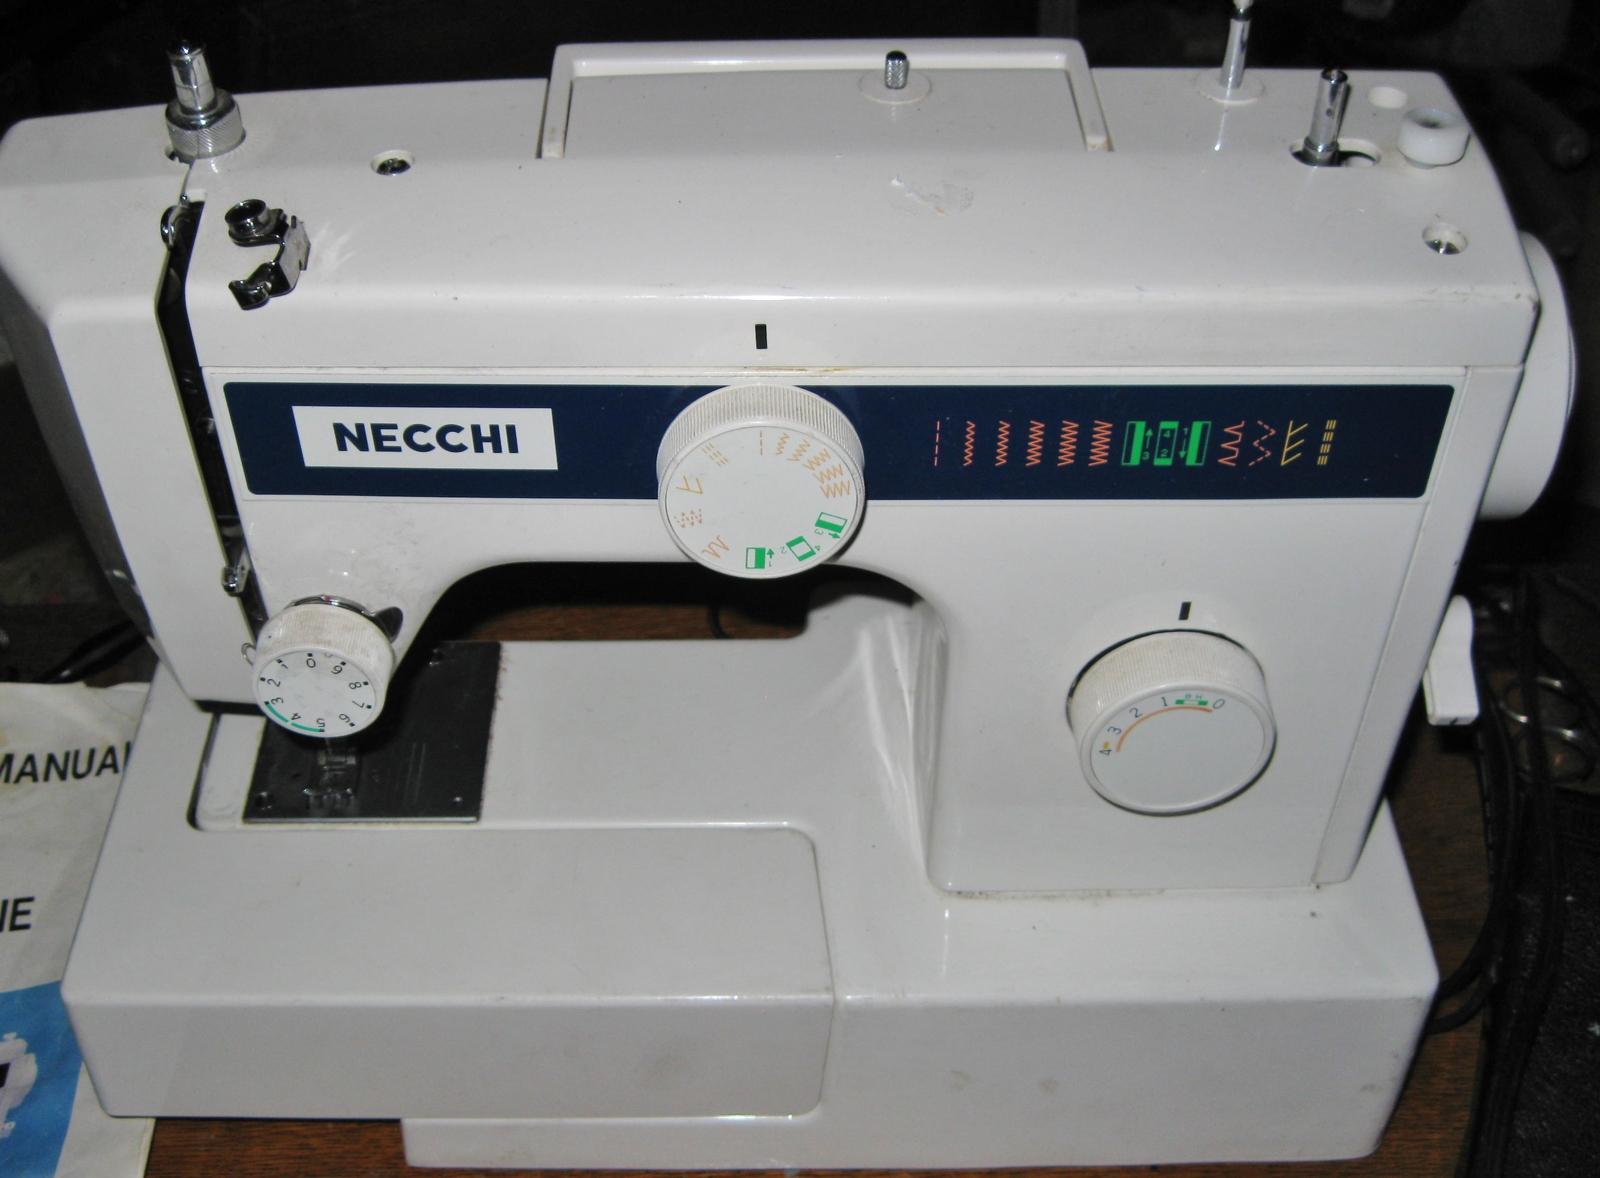 Necchi 3101fa Free Arm Instruction Manual And 50 Similar Items Supernova Sewing Machine Threading Diagram Vintage Heavy Duty 30 Page